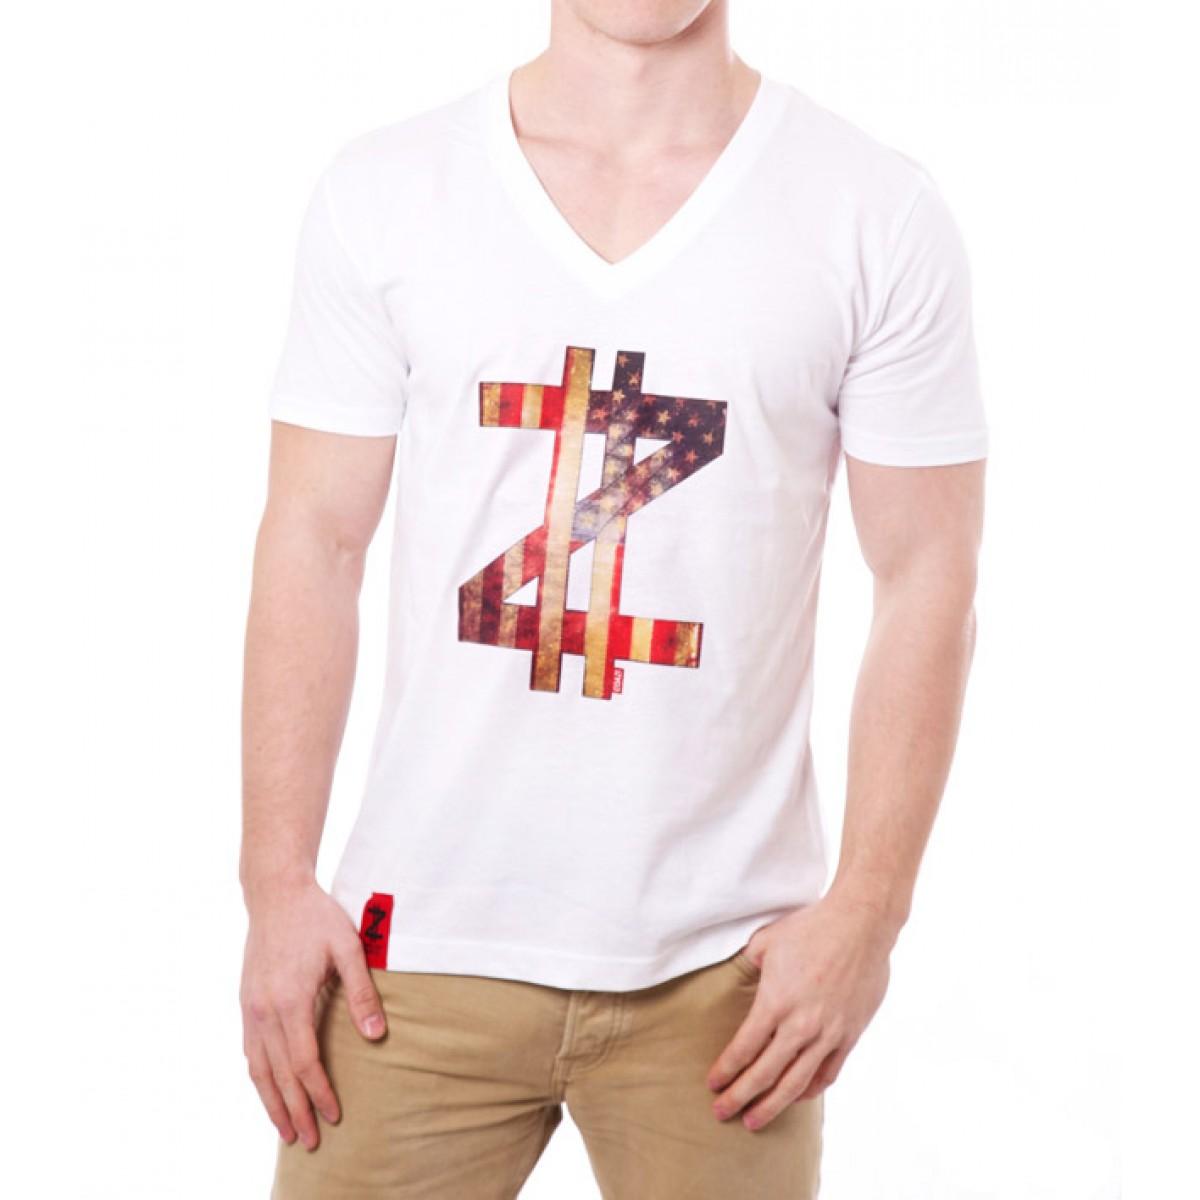 Coazi American Label V-Shirt | Bio Baumwolle & Fair Trade